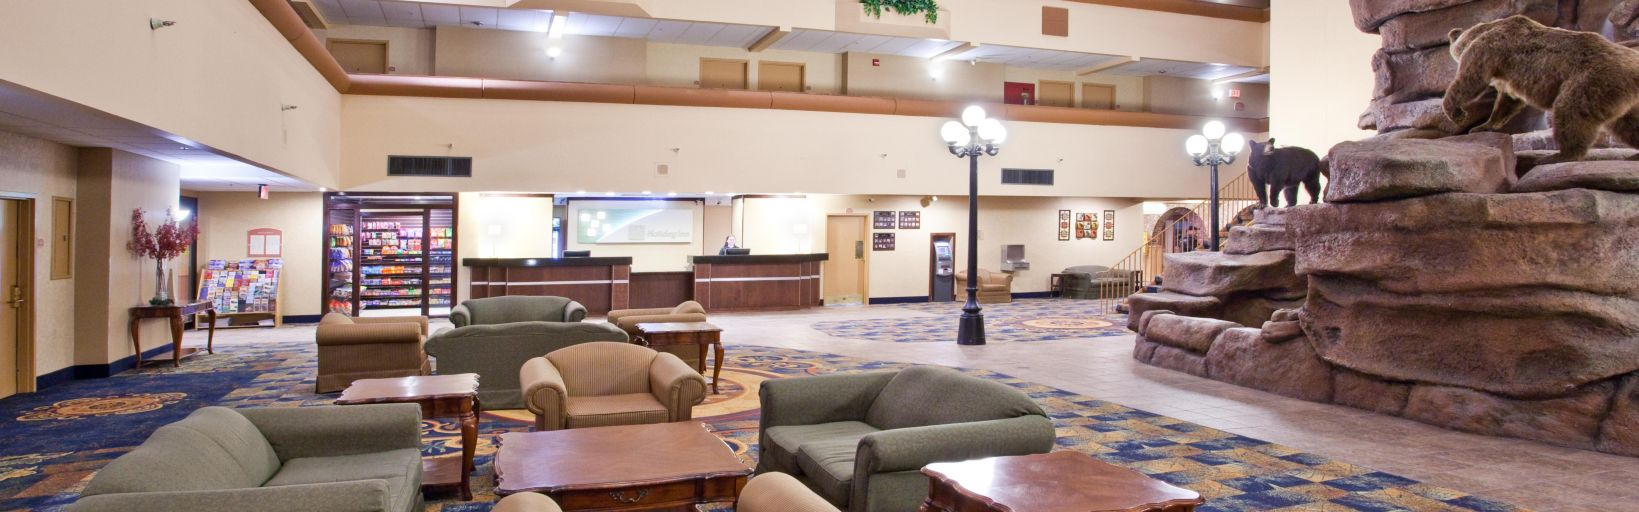 Great Falls Hotels | Holiday Inn Great Falls, MT | IHG